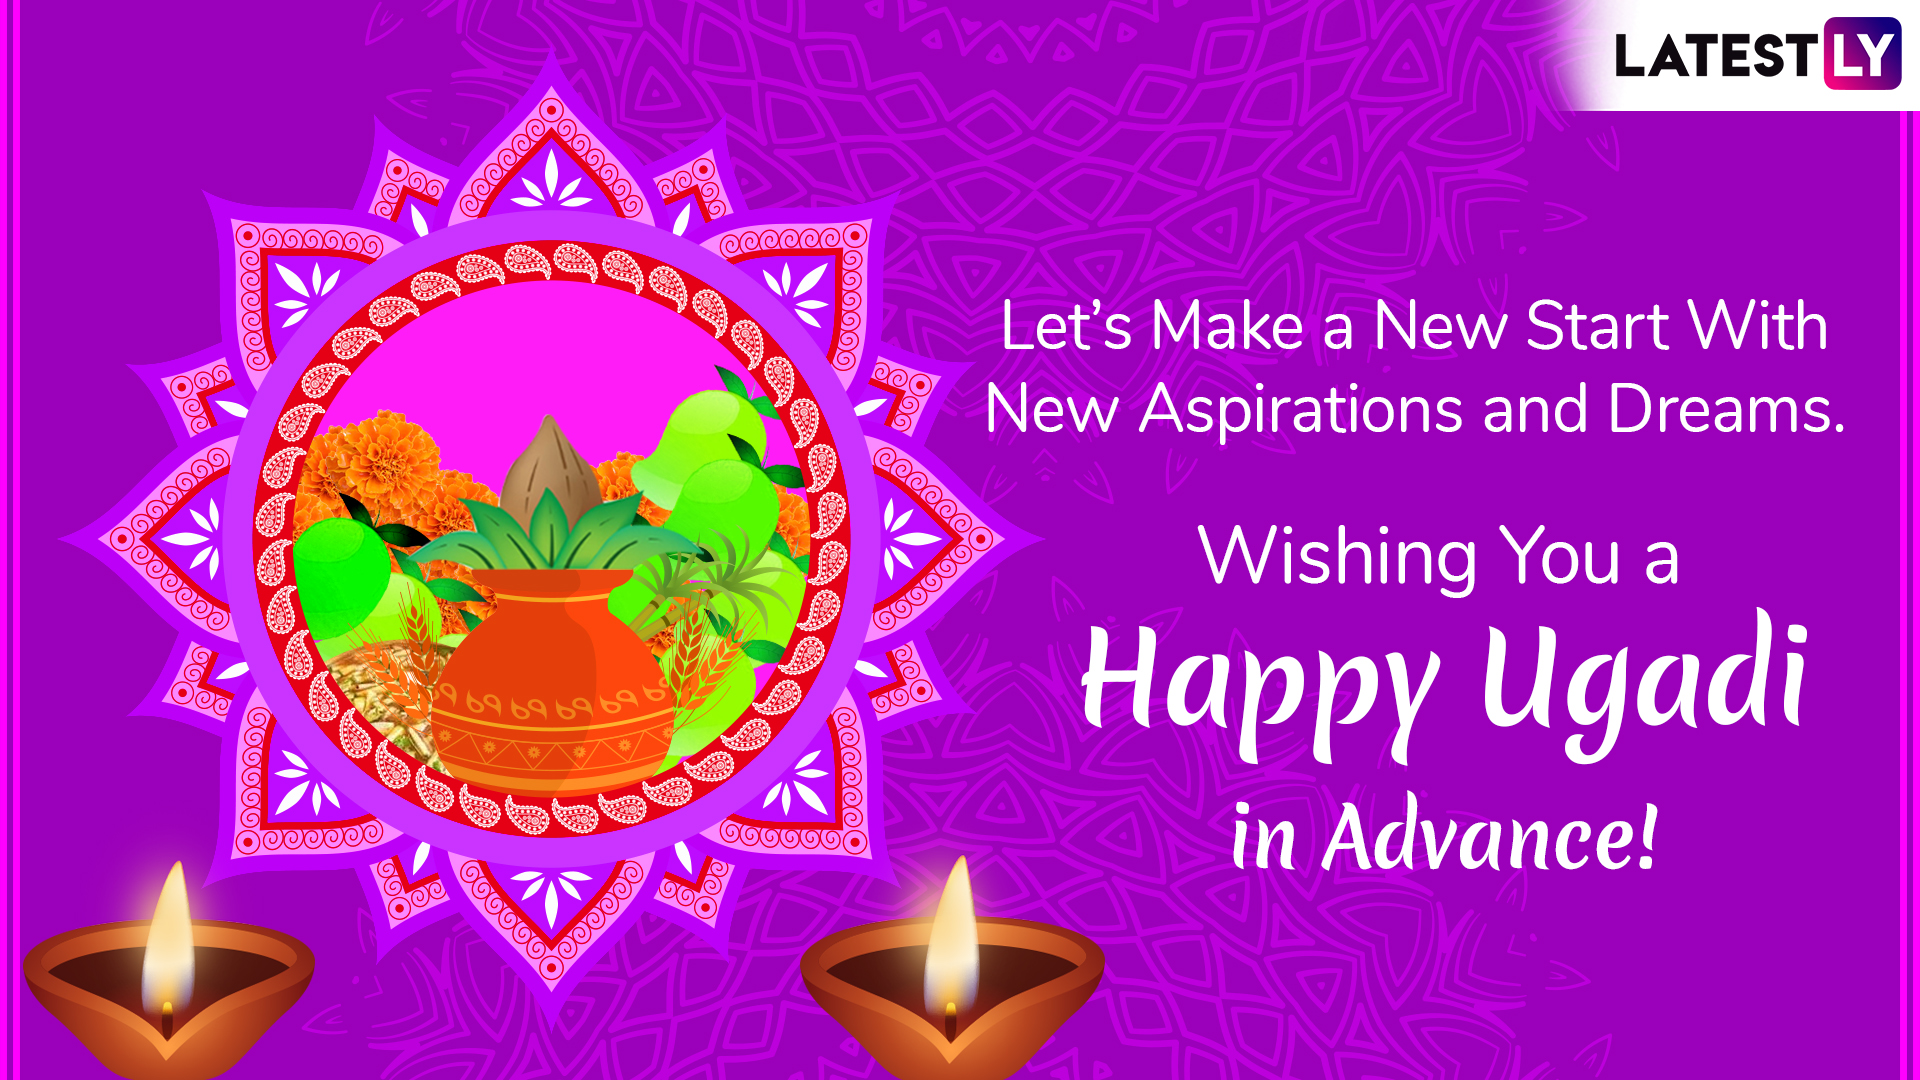 Happy Ugadi (Gudi Padwa) 2019 Wishes in Advance: Best